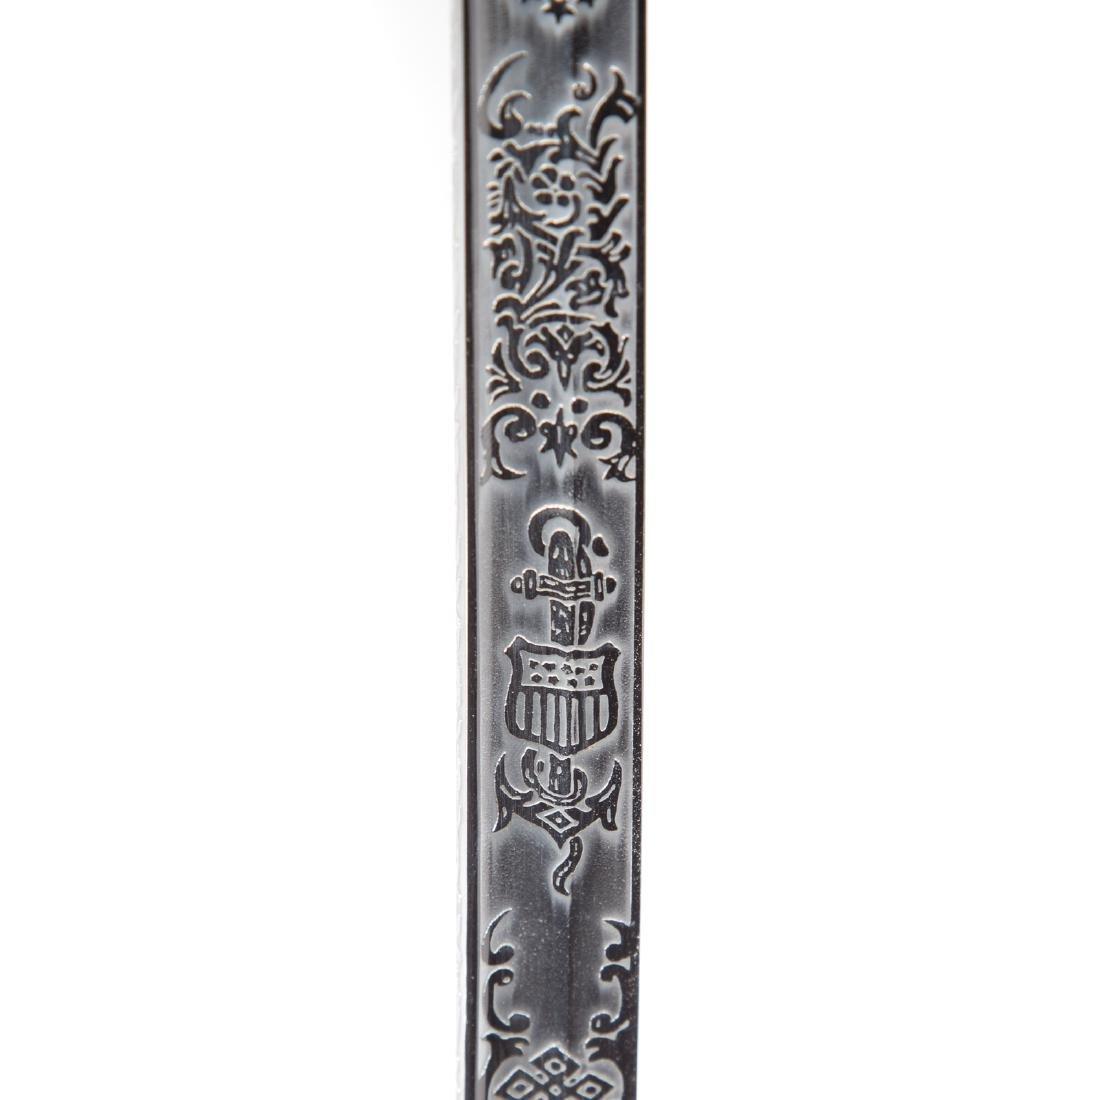 N.S. Meyer U.S. Navy Officer sword - 7